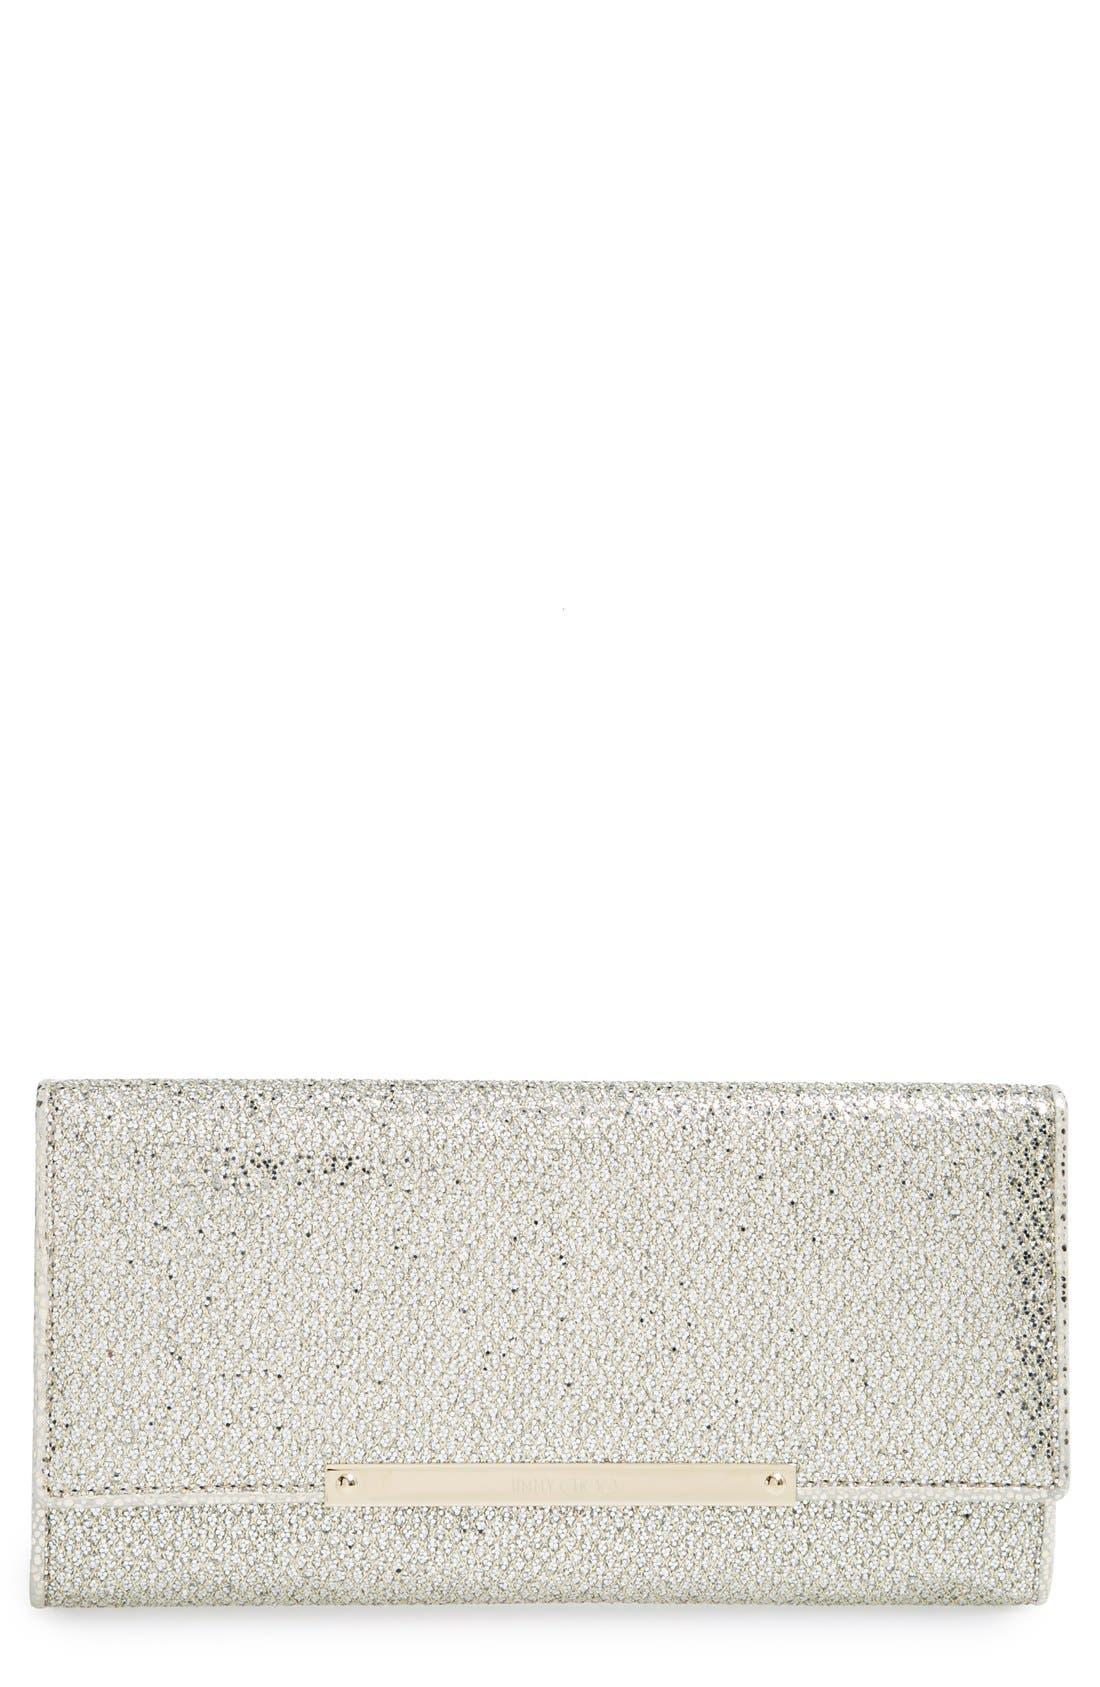 Main Image - Jimmy Choo 'Marilyn' Glitter Leather Clutch